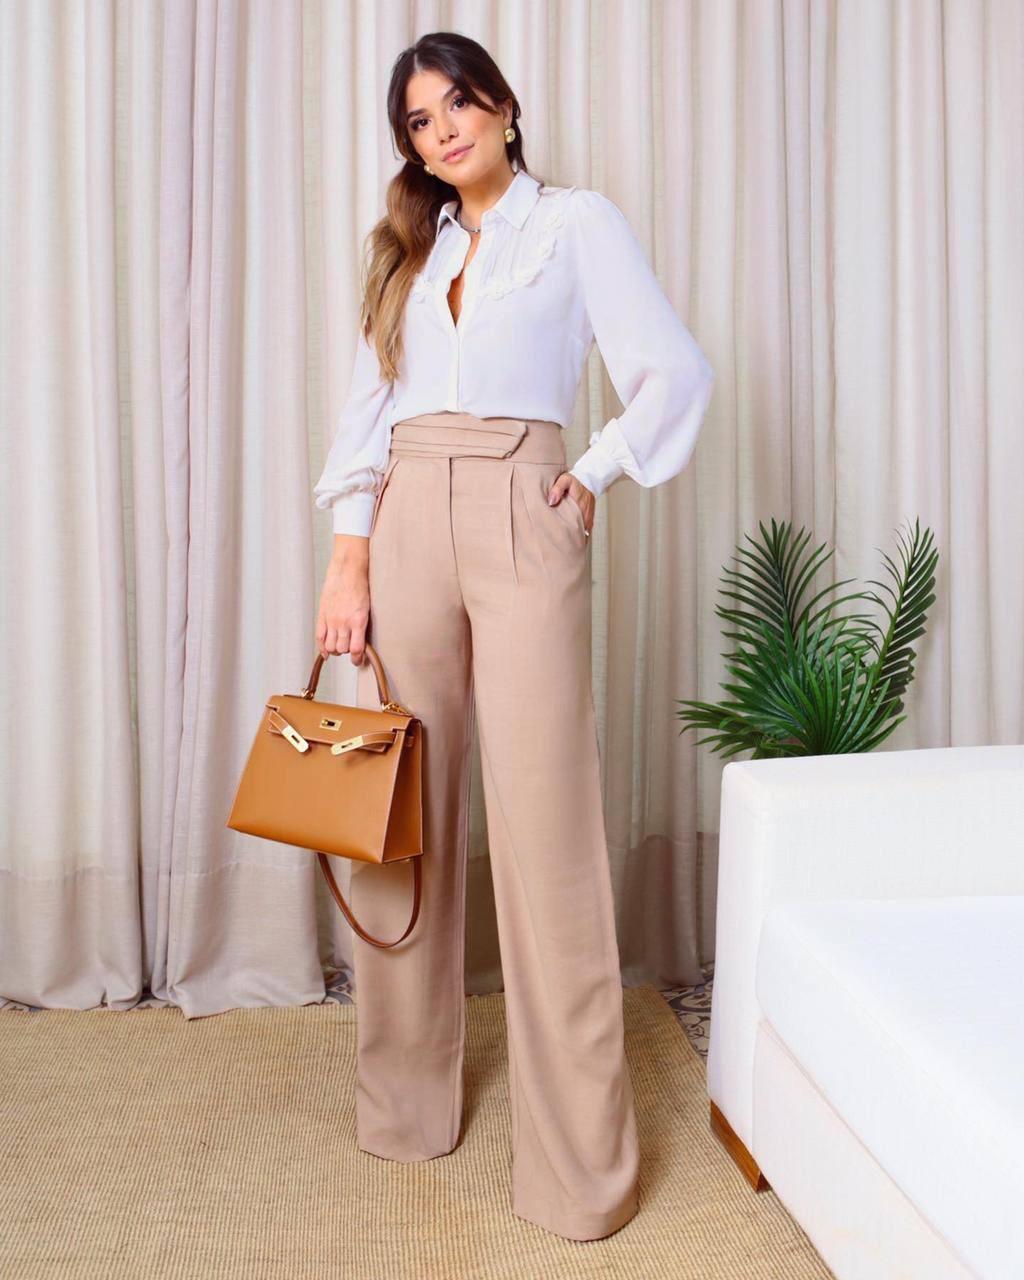 Calça Paloma Pantalona Viscose Twill Pregas ( Forro) Cintura Alta Detalhe Cós Transpasse